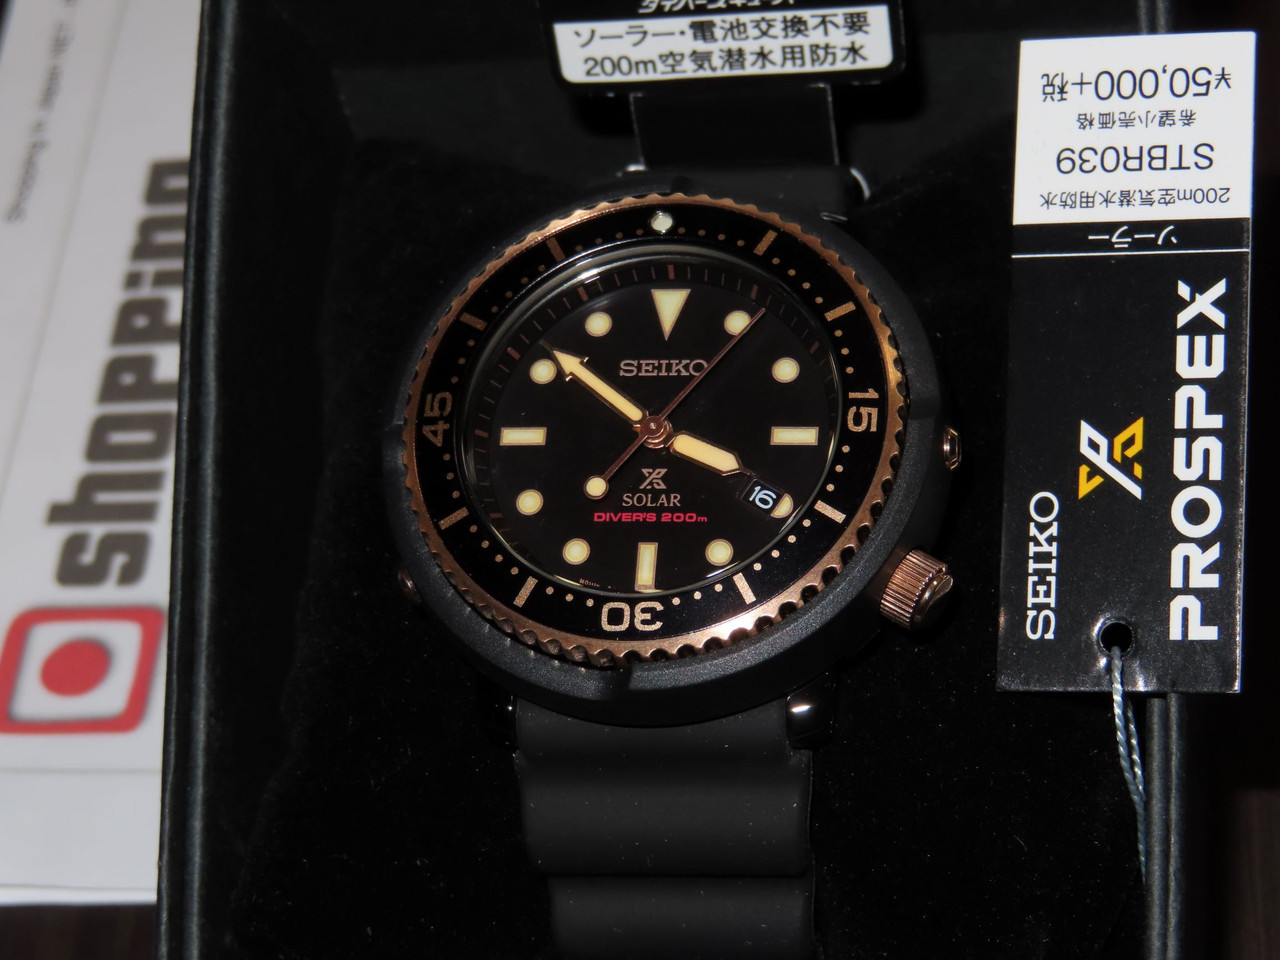 Seiko Prospex Japan Limited Edition STBR039